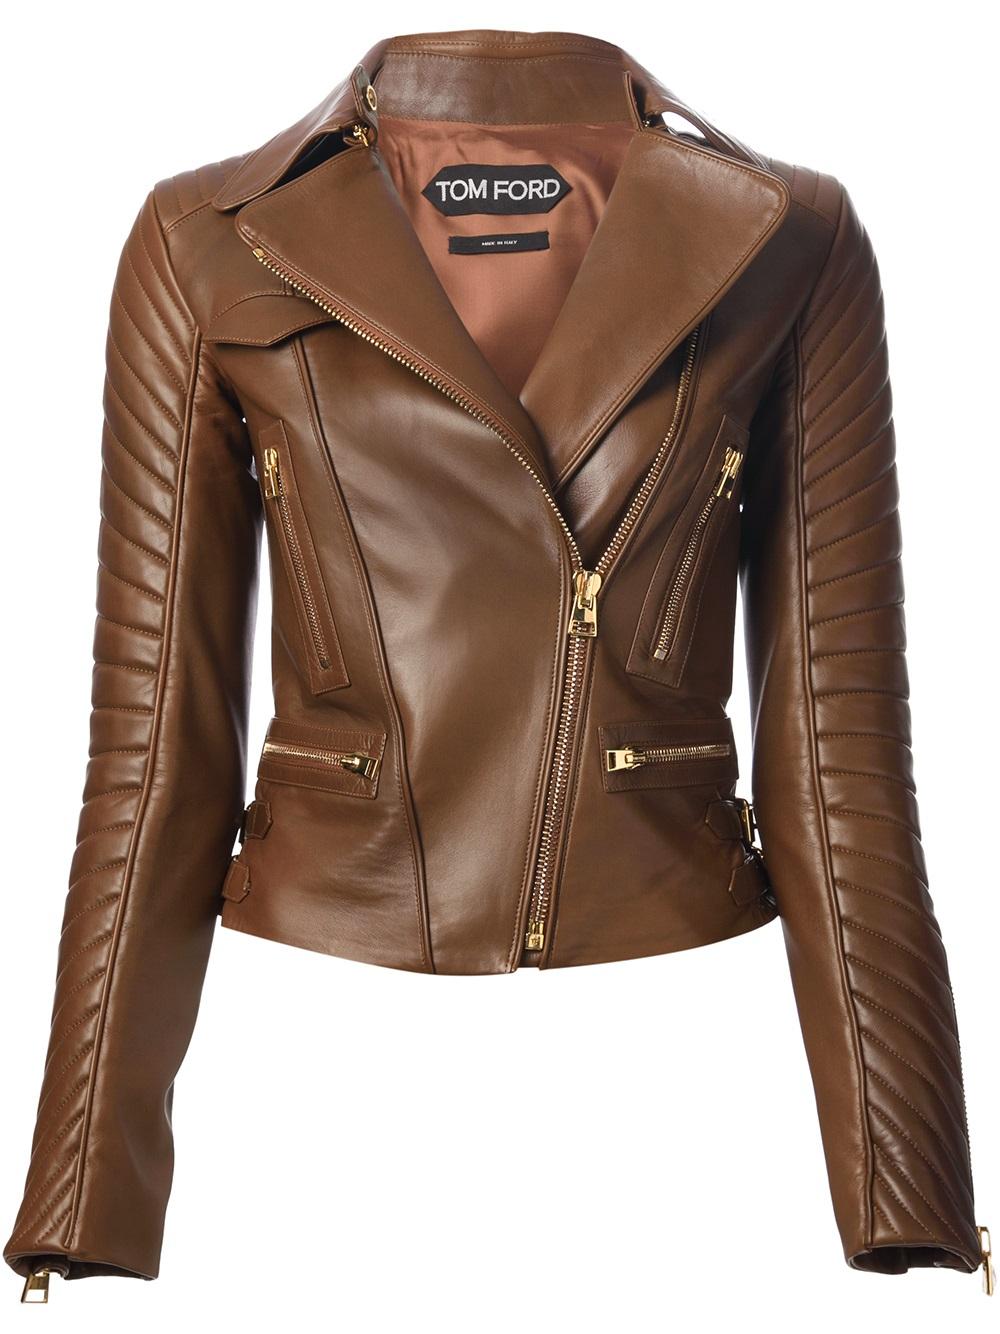 Good tom brown coats | LRZO